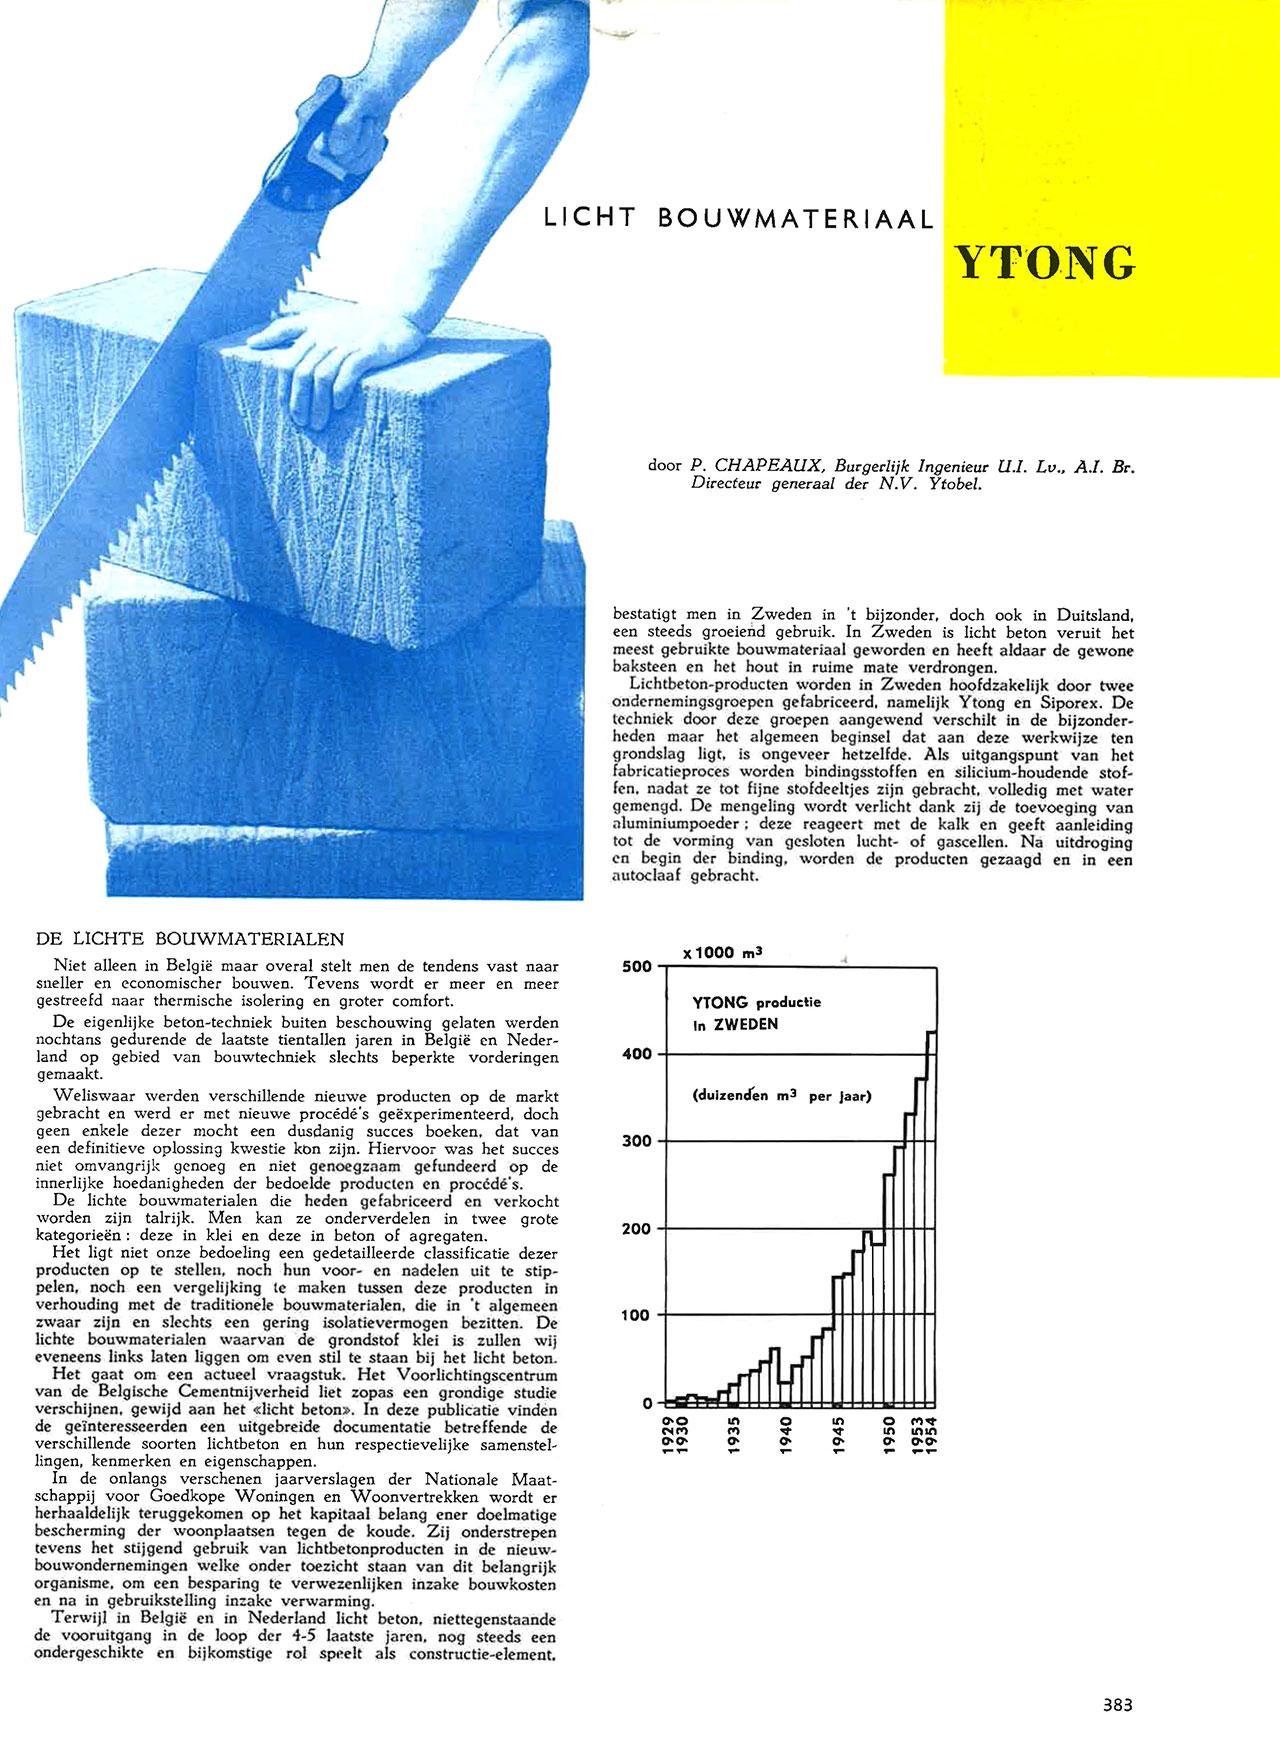 Licht bouwmateriaal Ytong